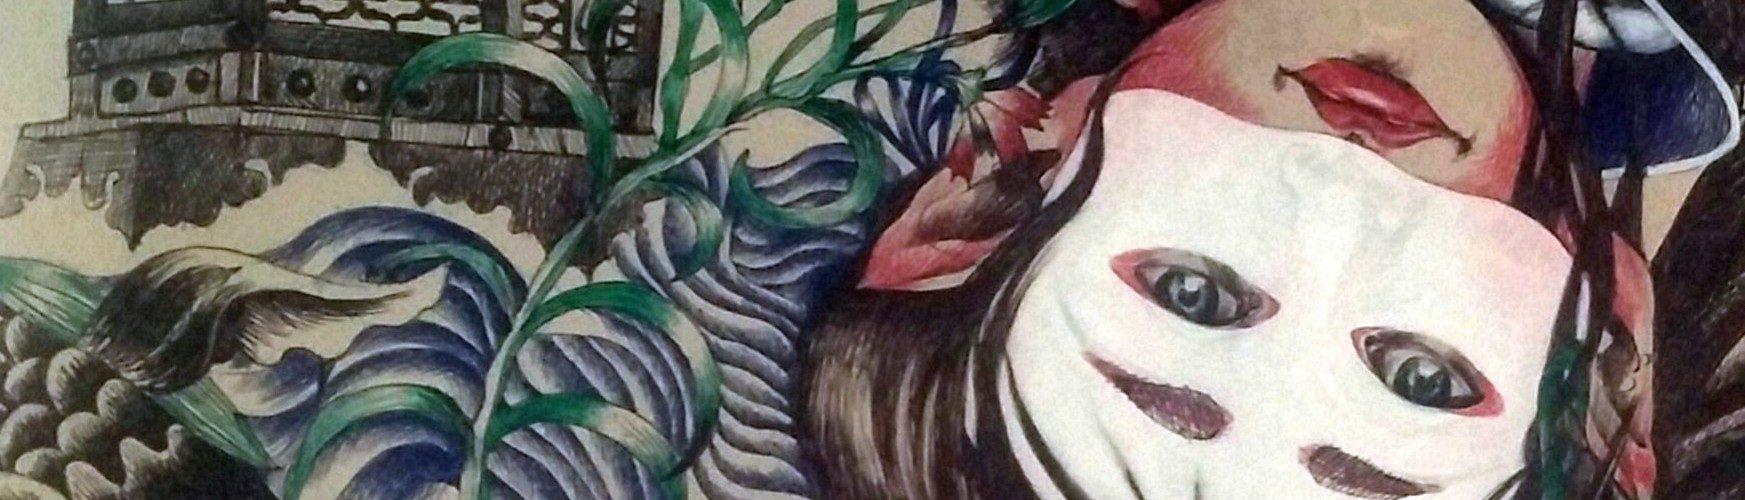 Gala Laskova présente ses dessins du 30 mars au 16 avril 2021